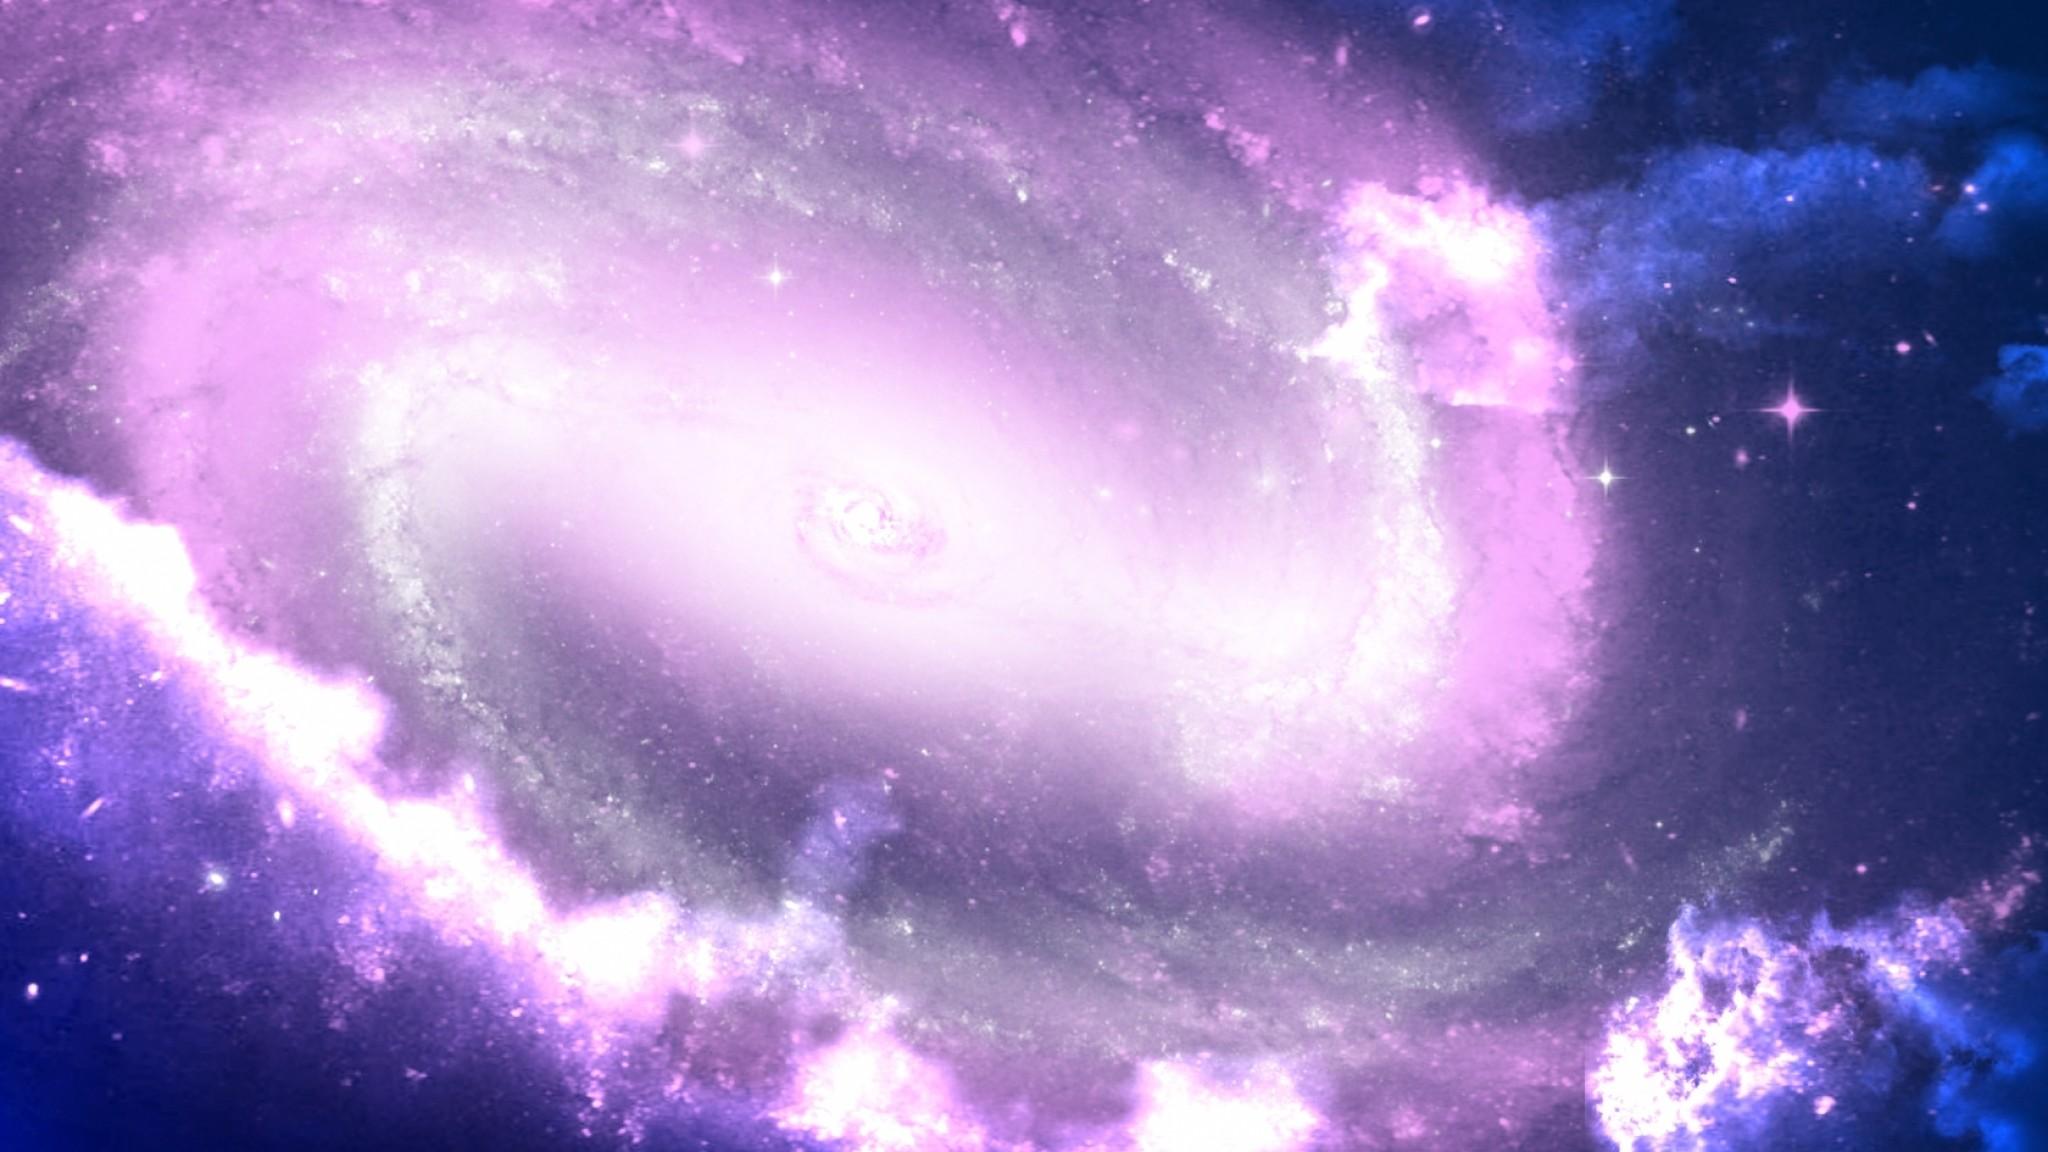 Wallpaper space, stars, galaxy